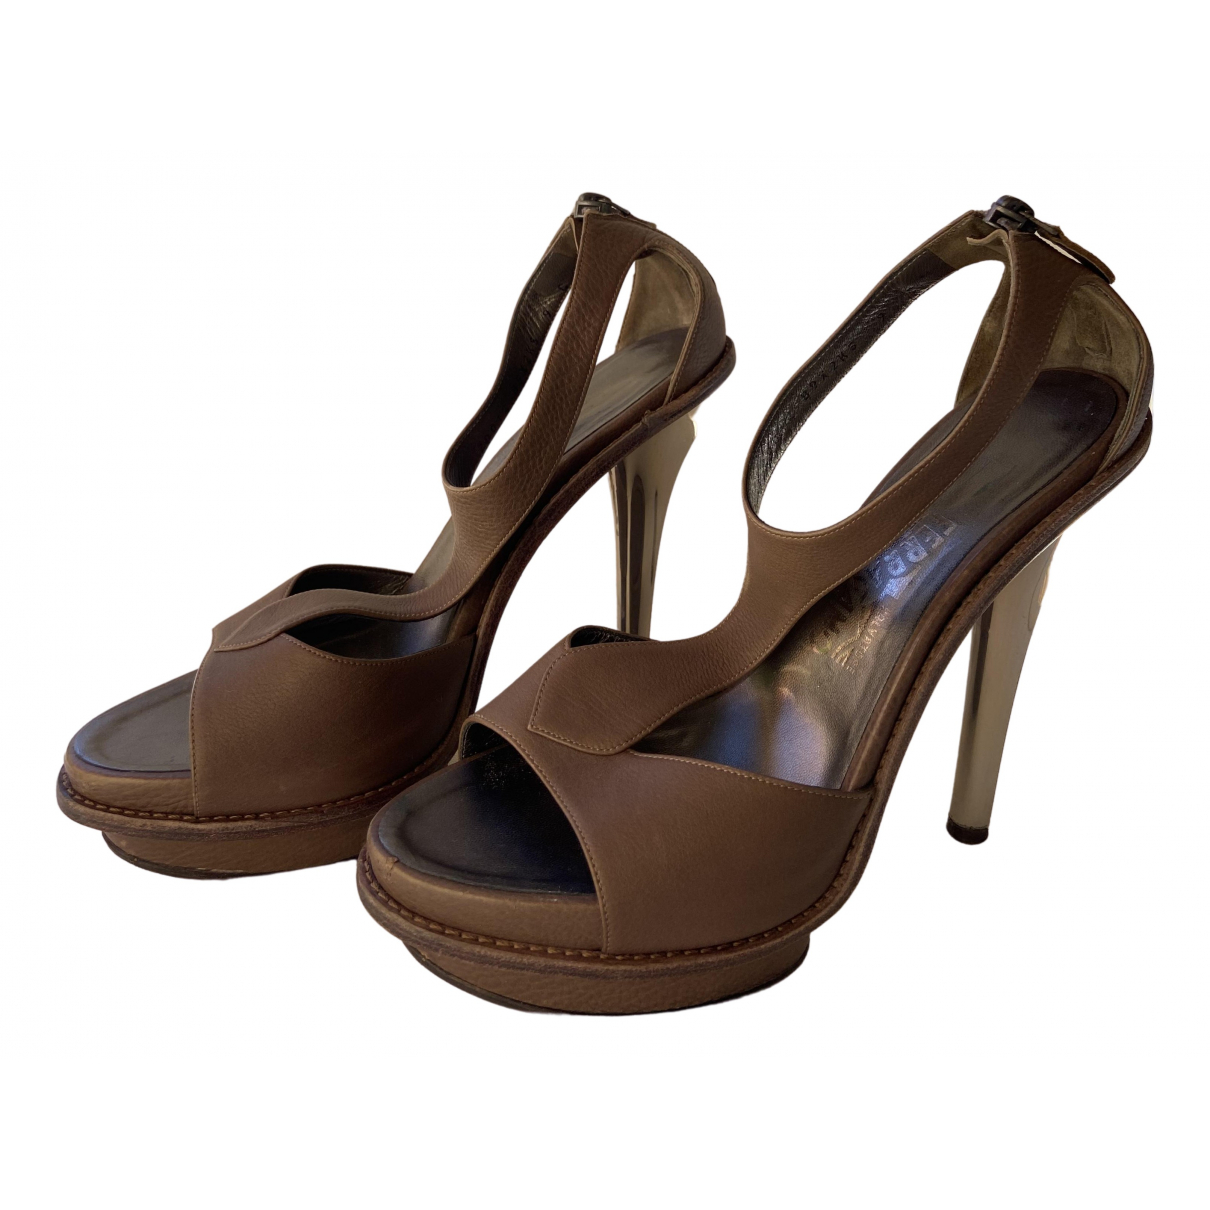 Salvatore Ferragamo \N Grey Leather Sandals for Women 9 US